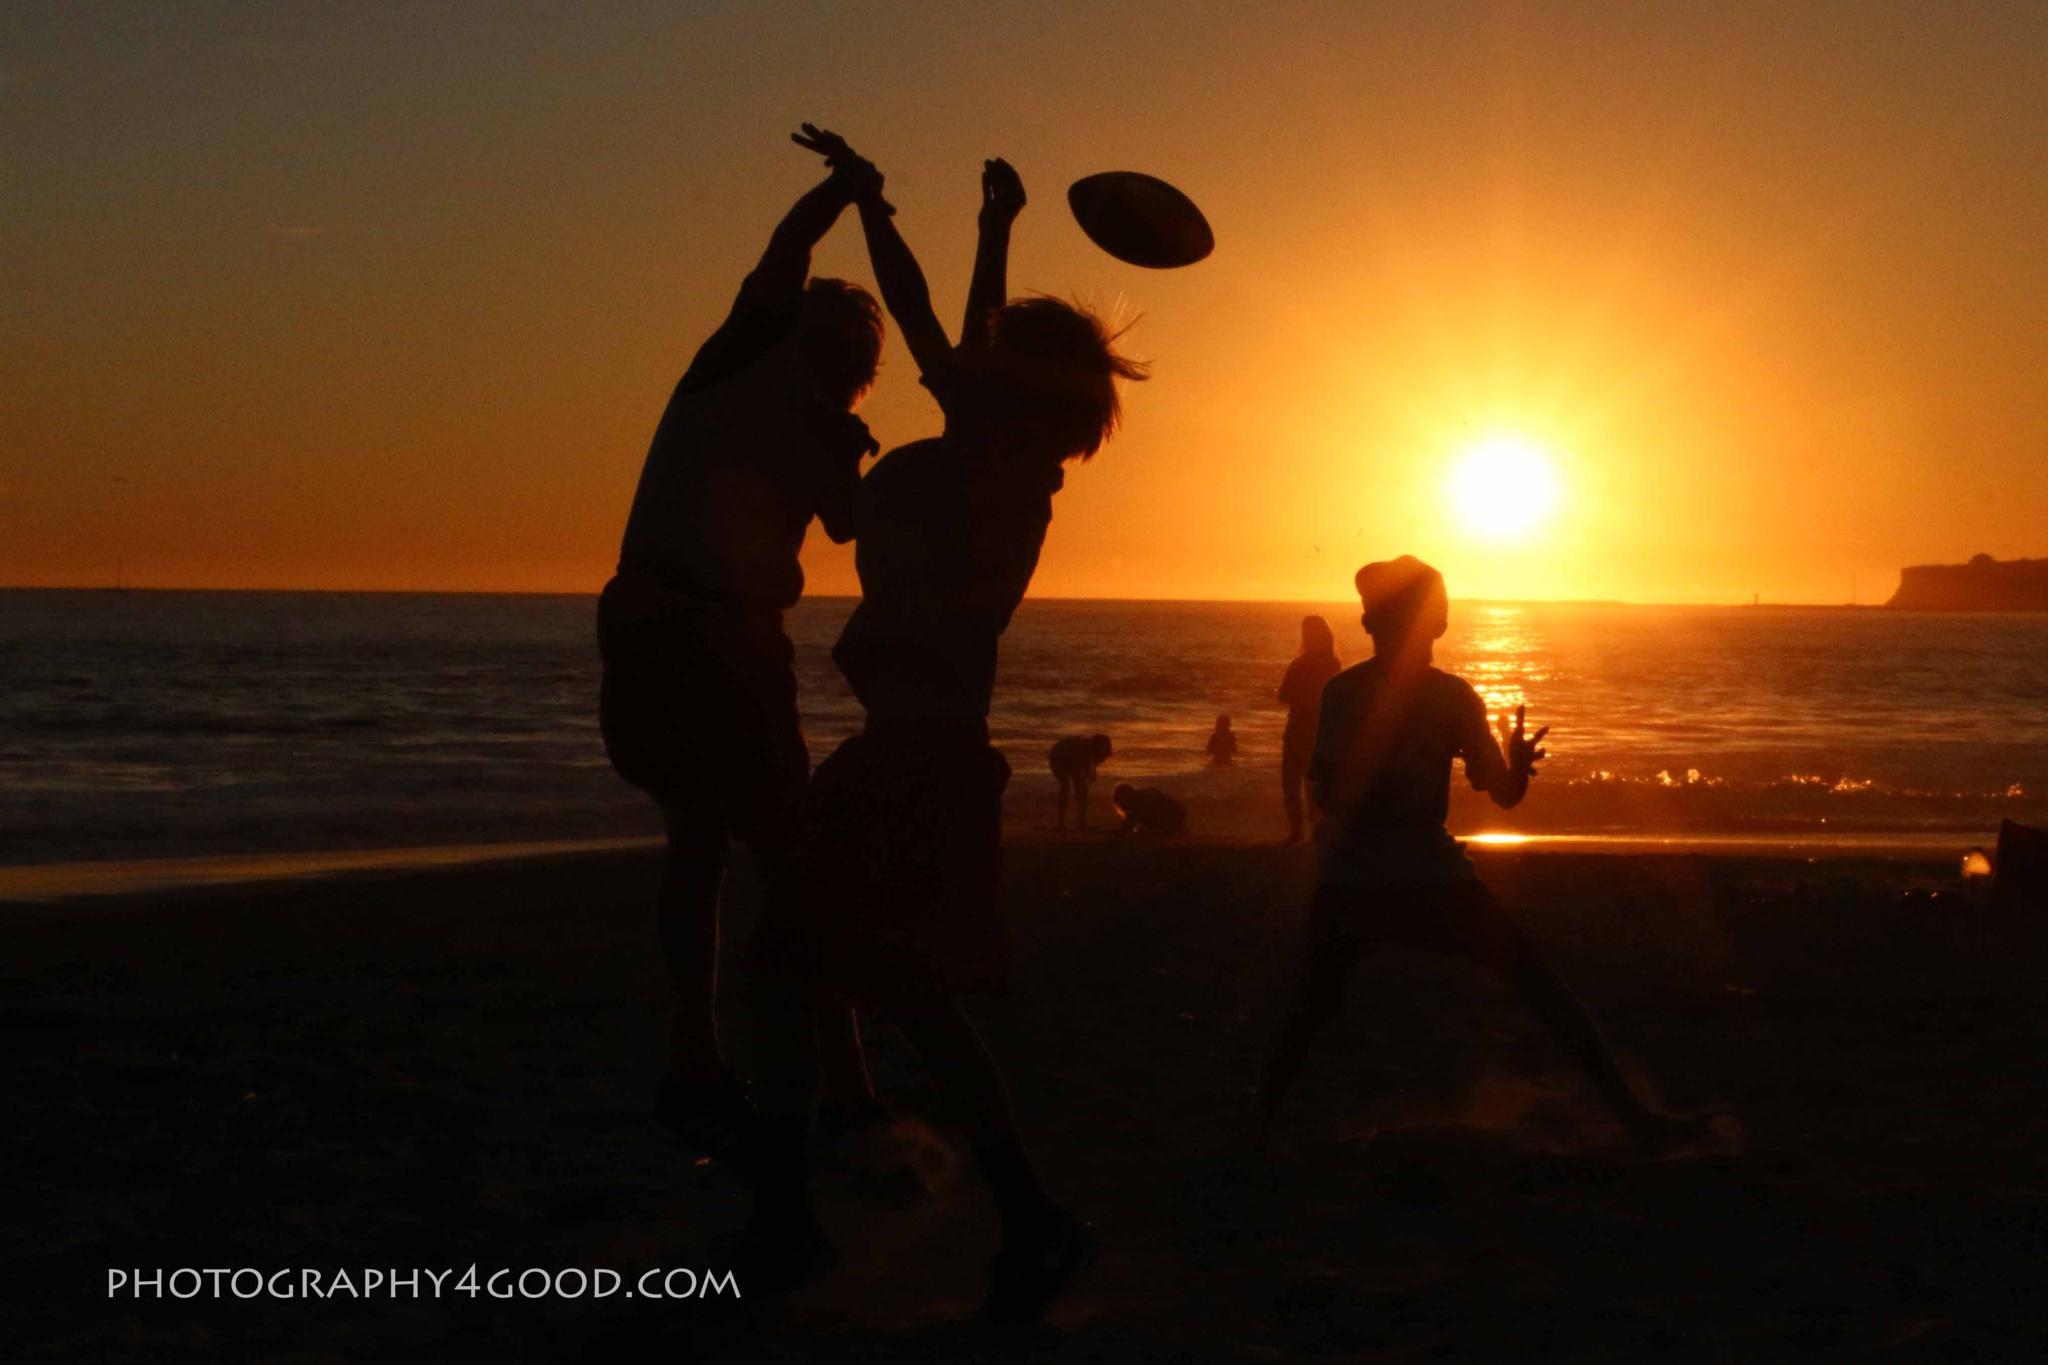 Sunset football on the beach by John_Ediger